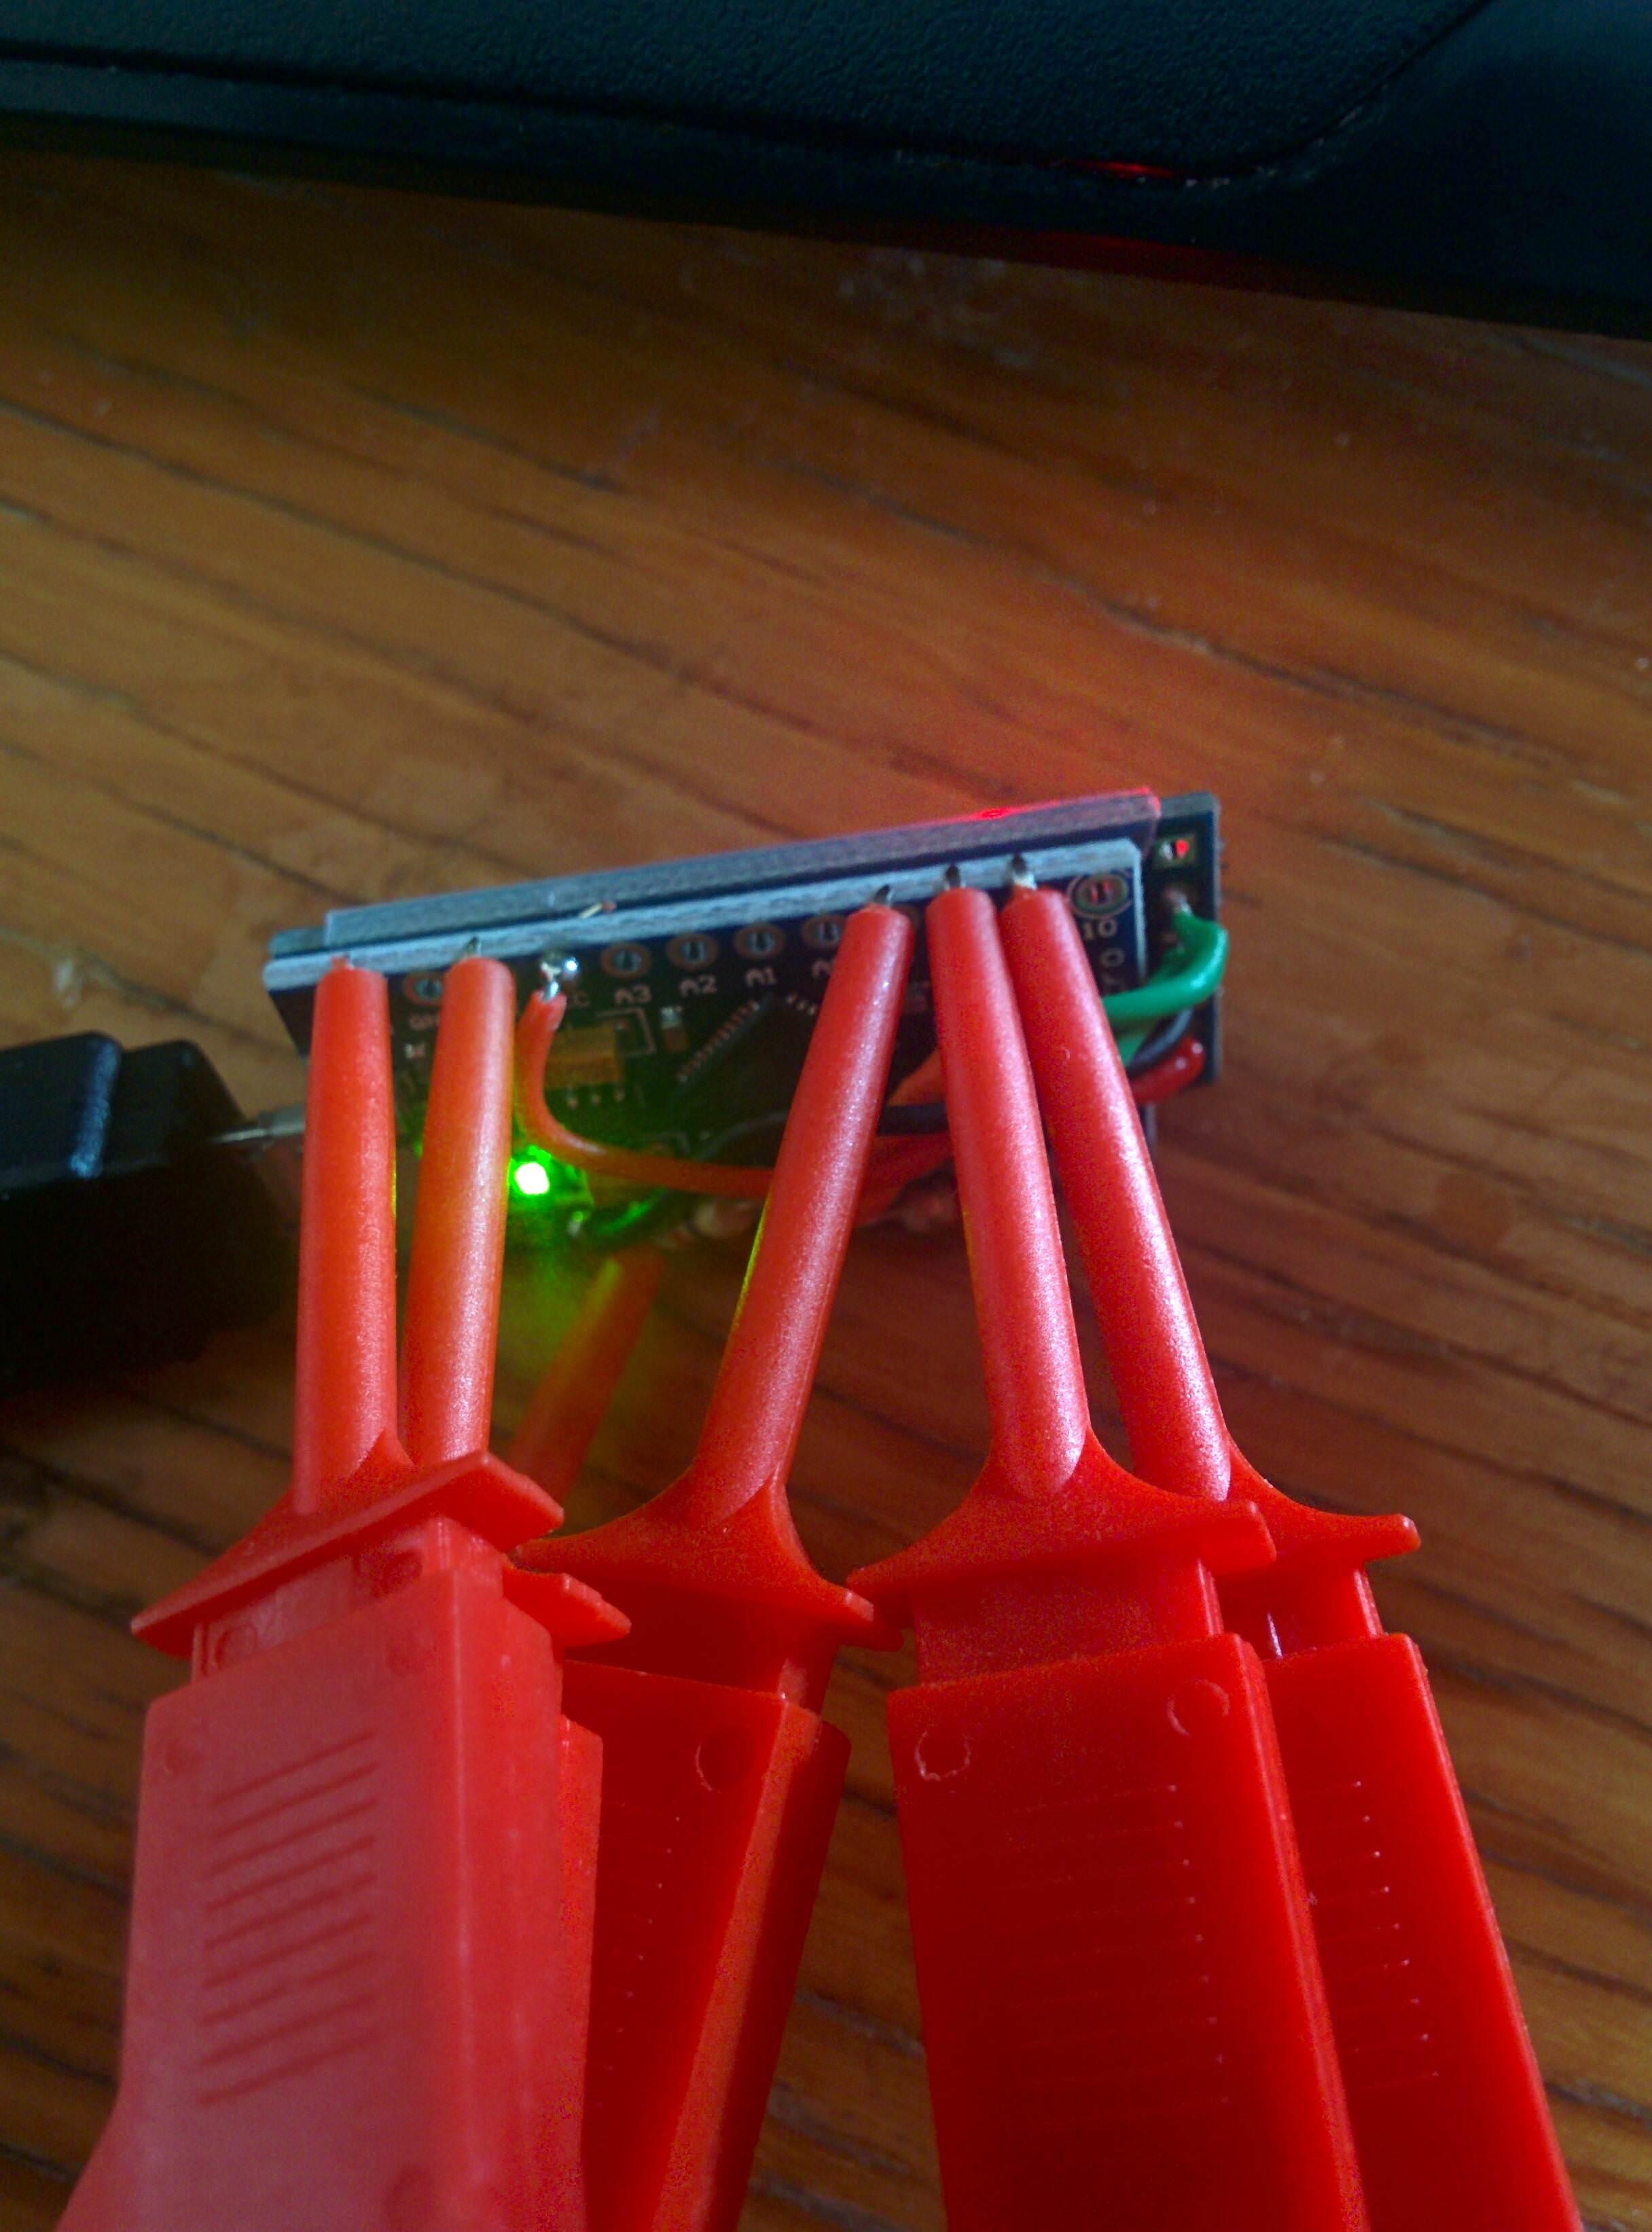 wiring-image-practical-2